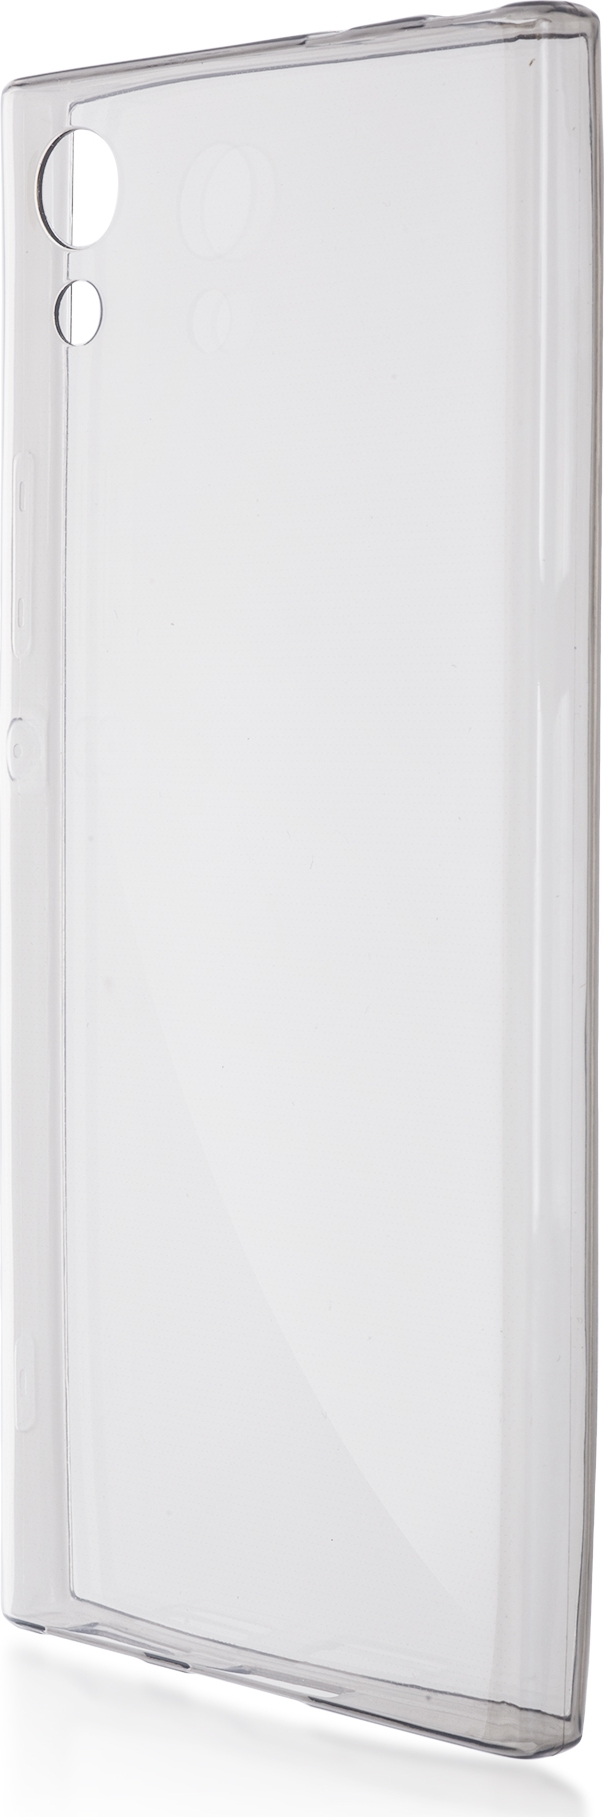 Чехол Brosco TPU для Sony Xperia XA1, черный чехол для sony g3412 xperia xa1 plus brosco накладка черный